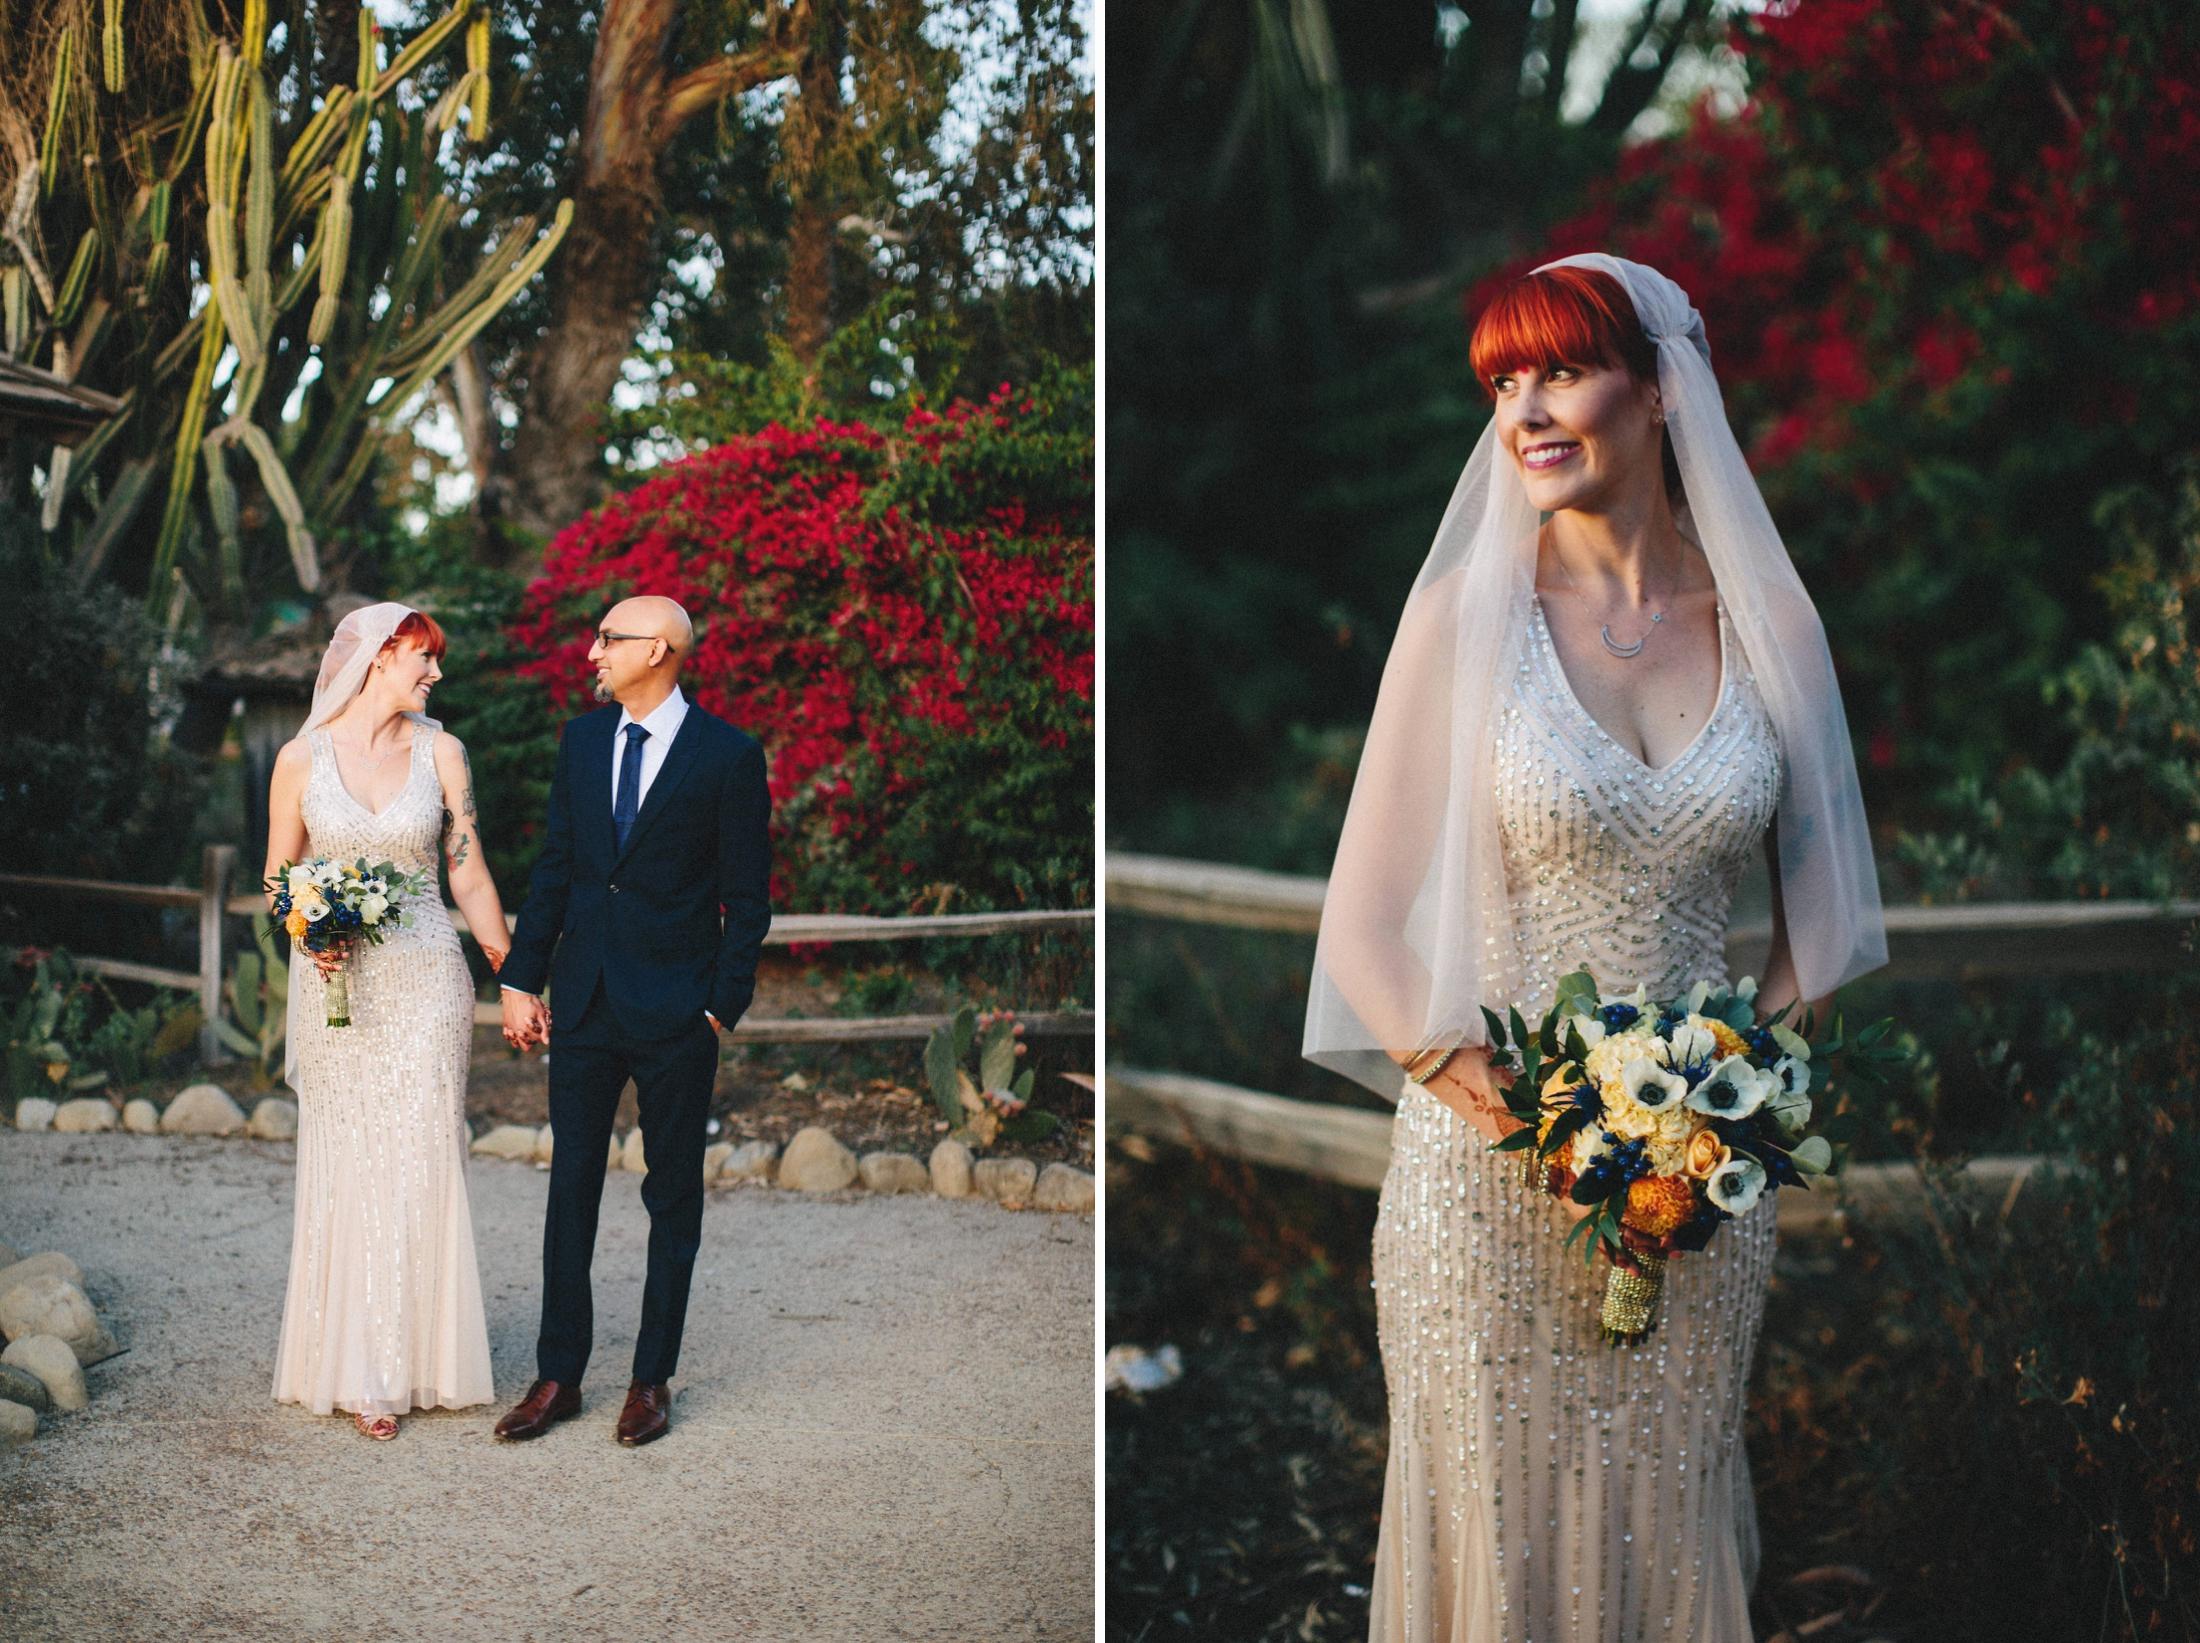 Modern-Indian-Serra-Plaza-wedding-076.jpg